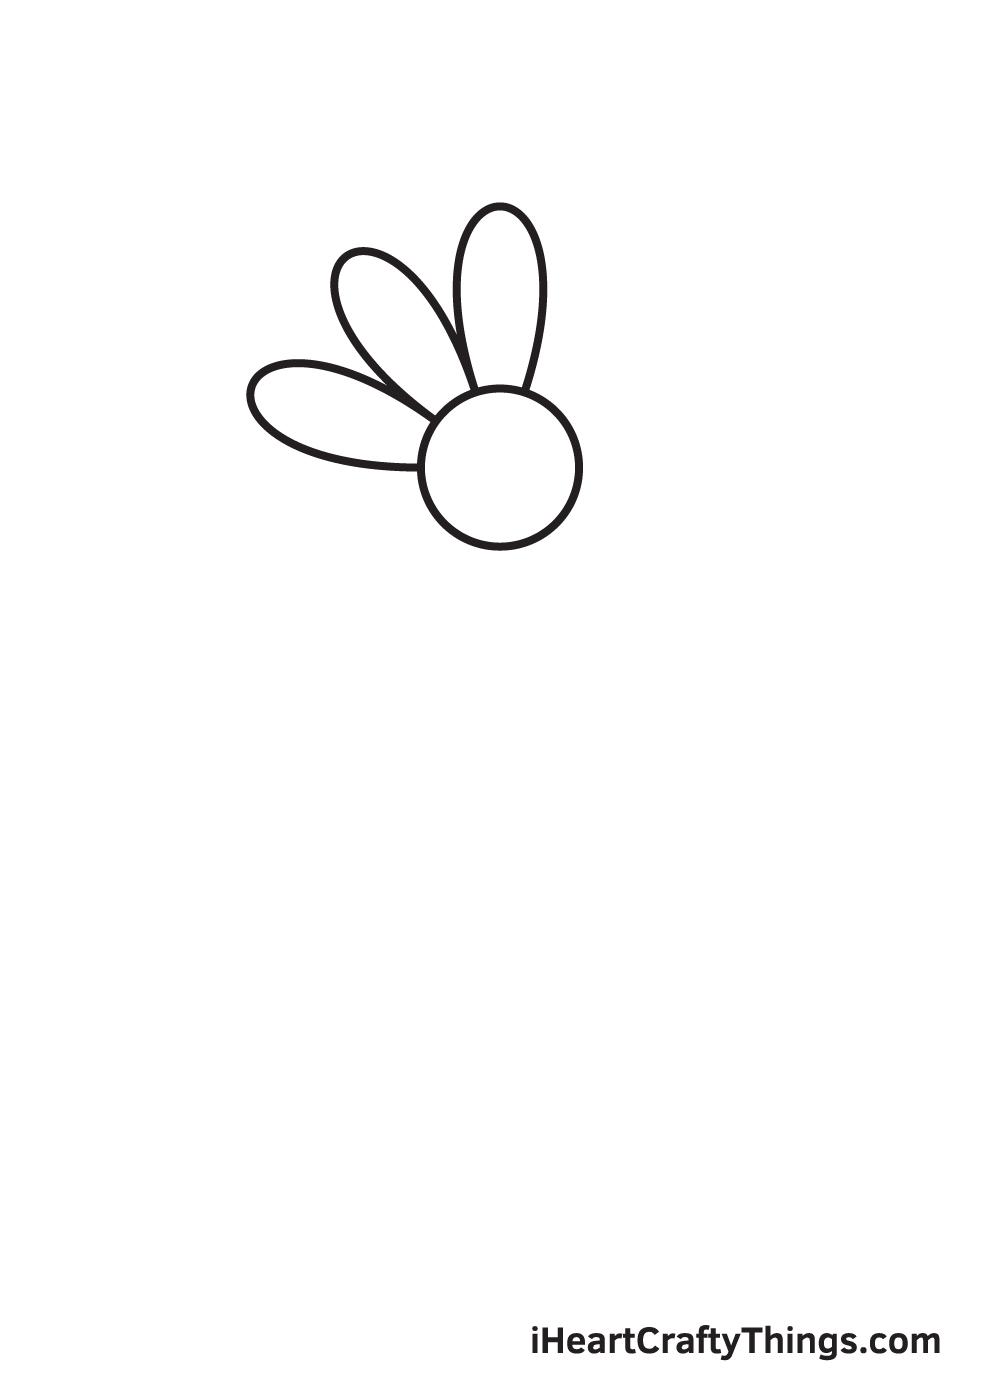 daisy drawing - step 2